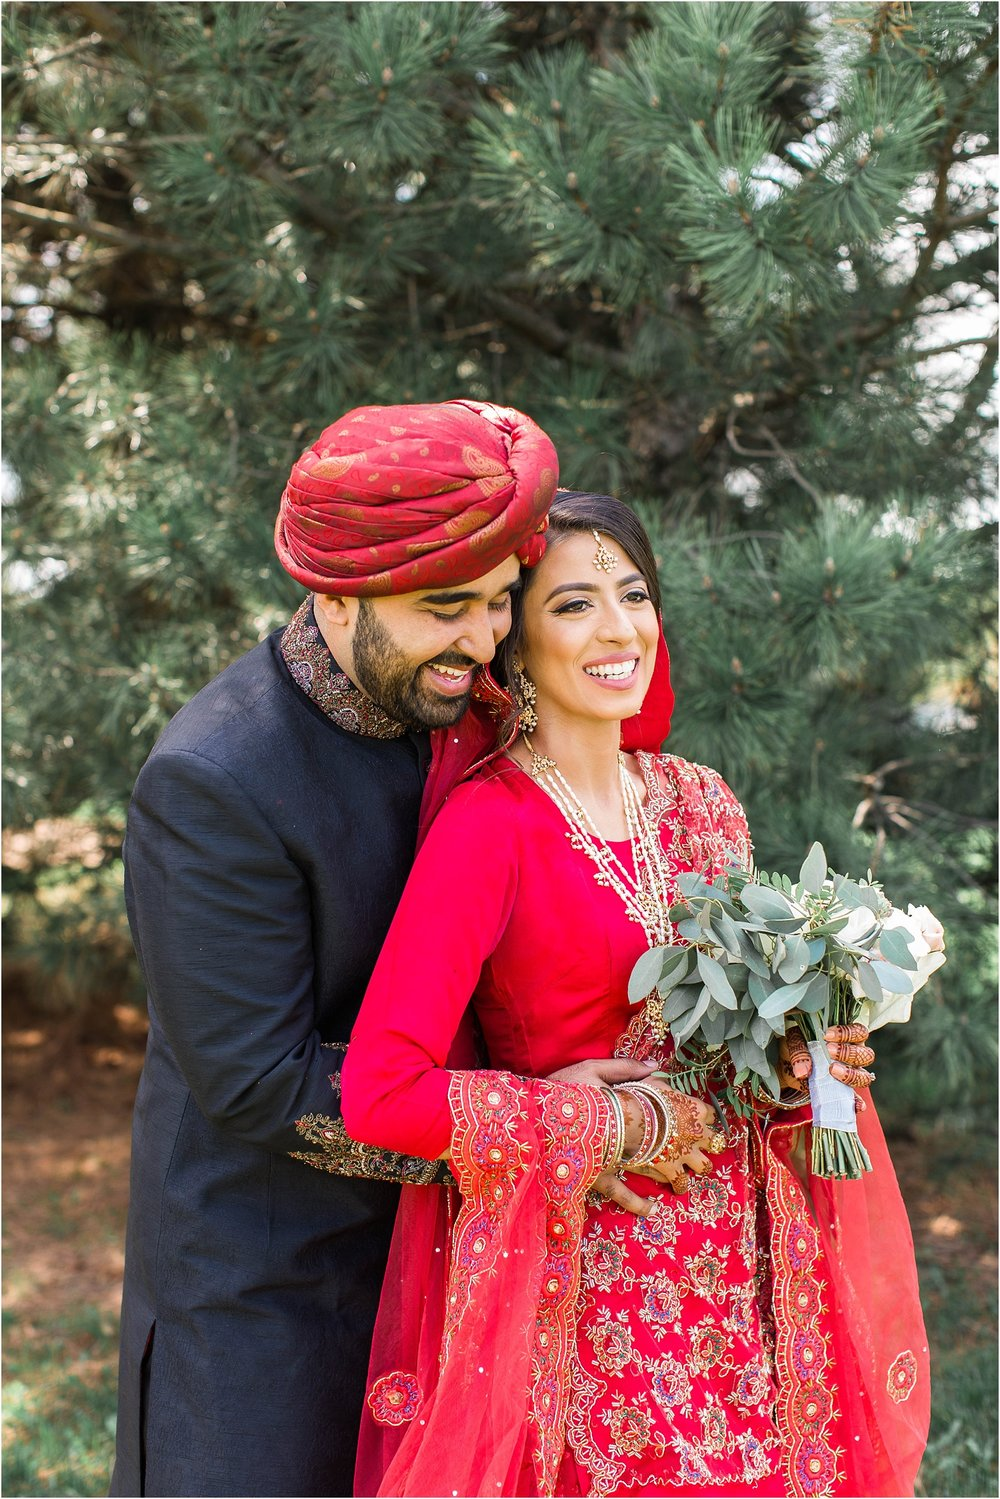 Jame-Masjid-Coopers-Mosque-Kariya-Park-Cherry-Blossoms-Wedding-Toronto-Mississauga-Brampton-Scarborough-GTA-Pakistani-Indian-Wedding-Engagement-Photographer-Photography_0019.jpg